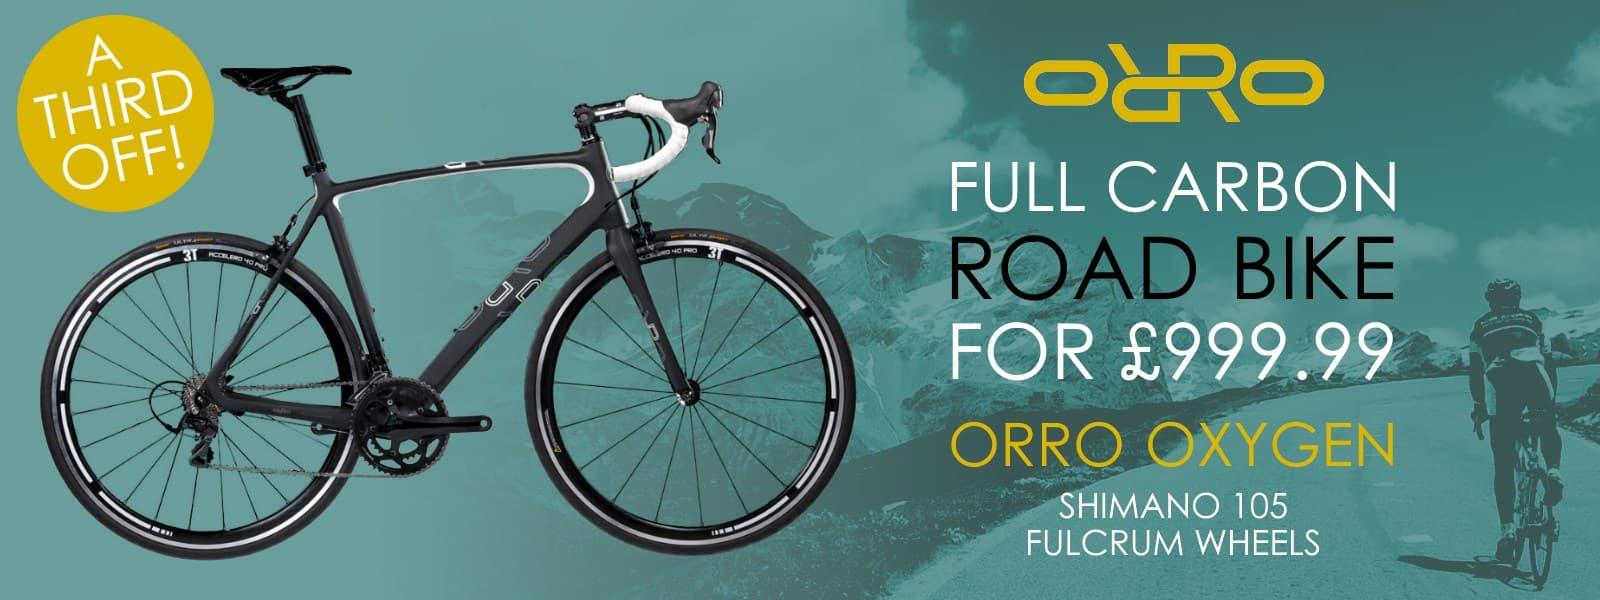 Orro Oxygen Road Bike